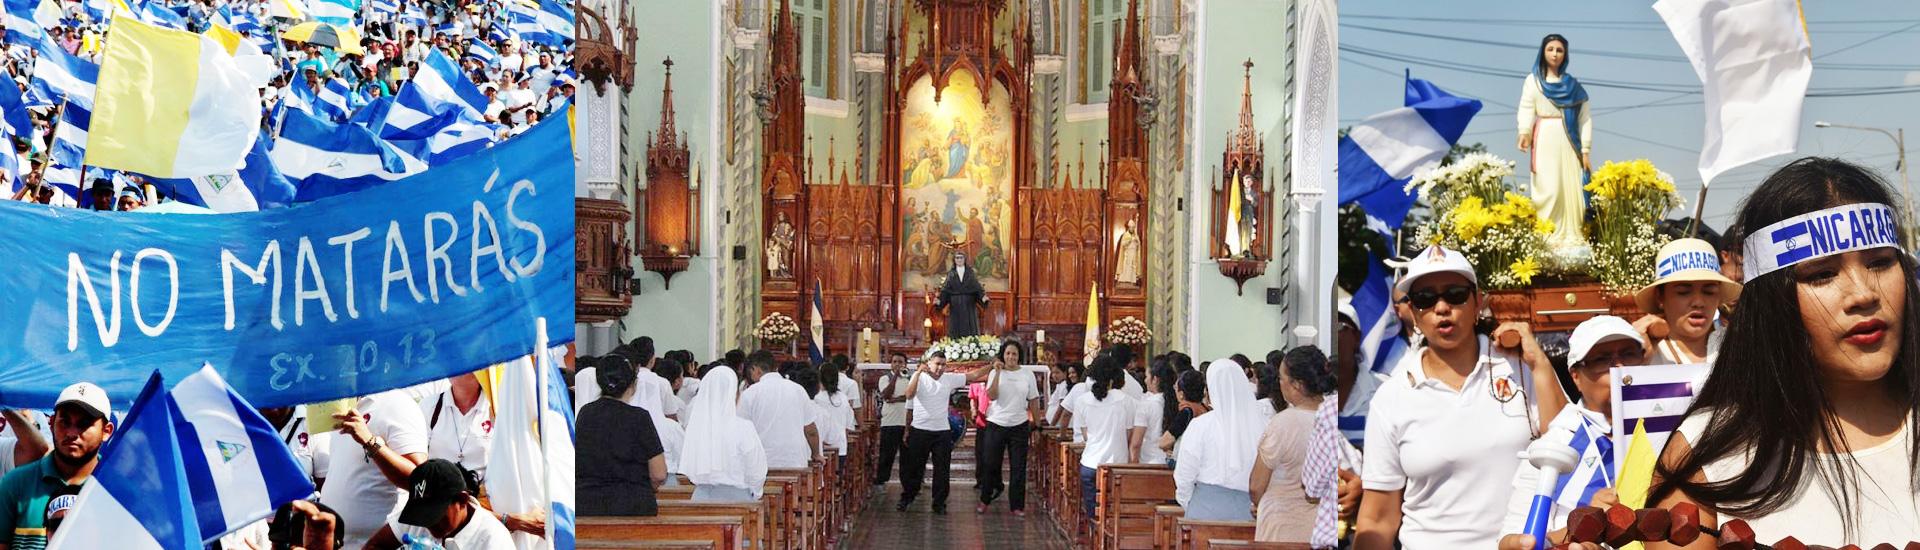 La Iglesia promueve la paz en Nicaragua